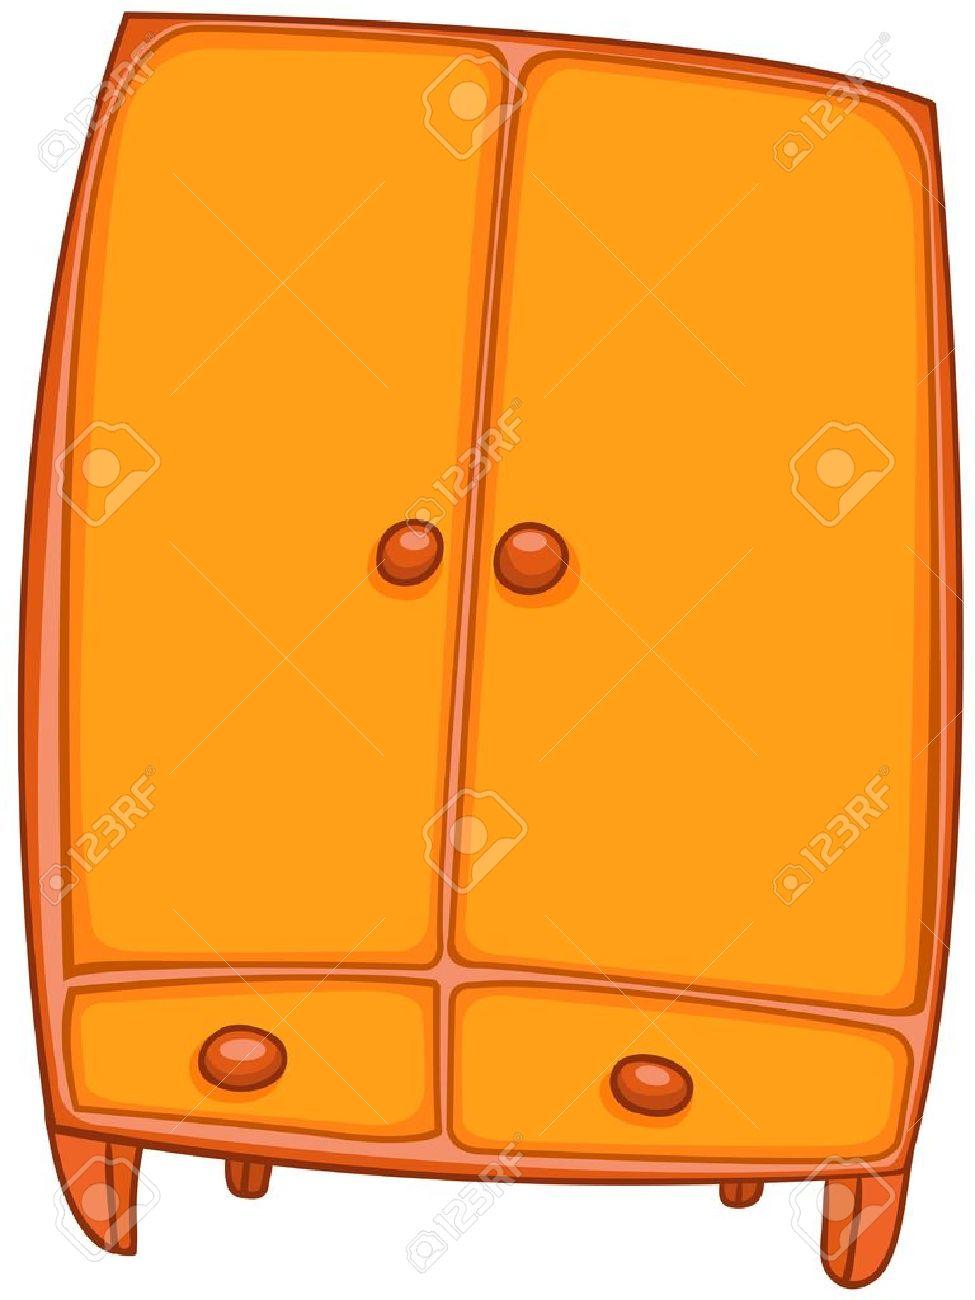 Cartoon Home Furniture Wardrobe - 12372192